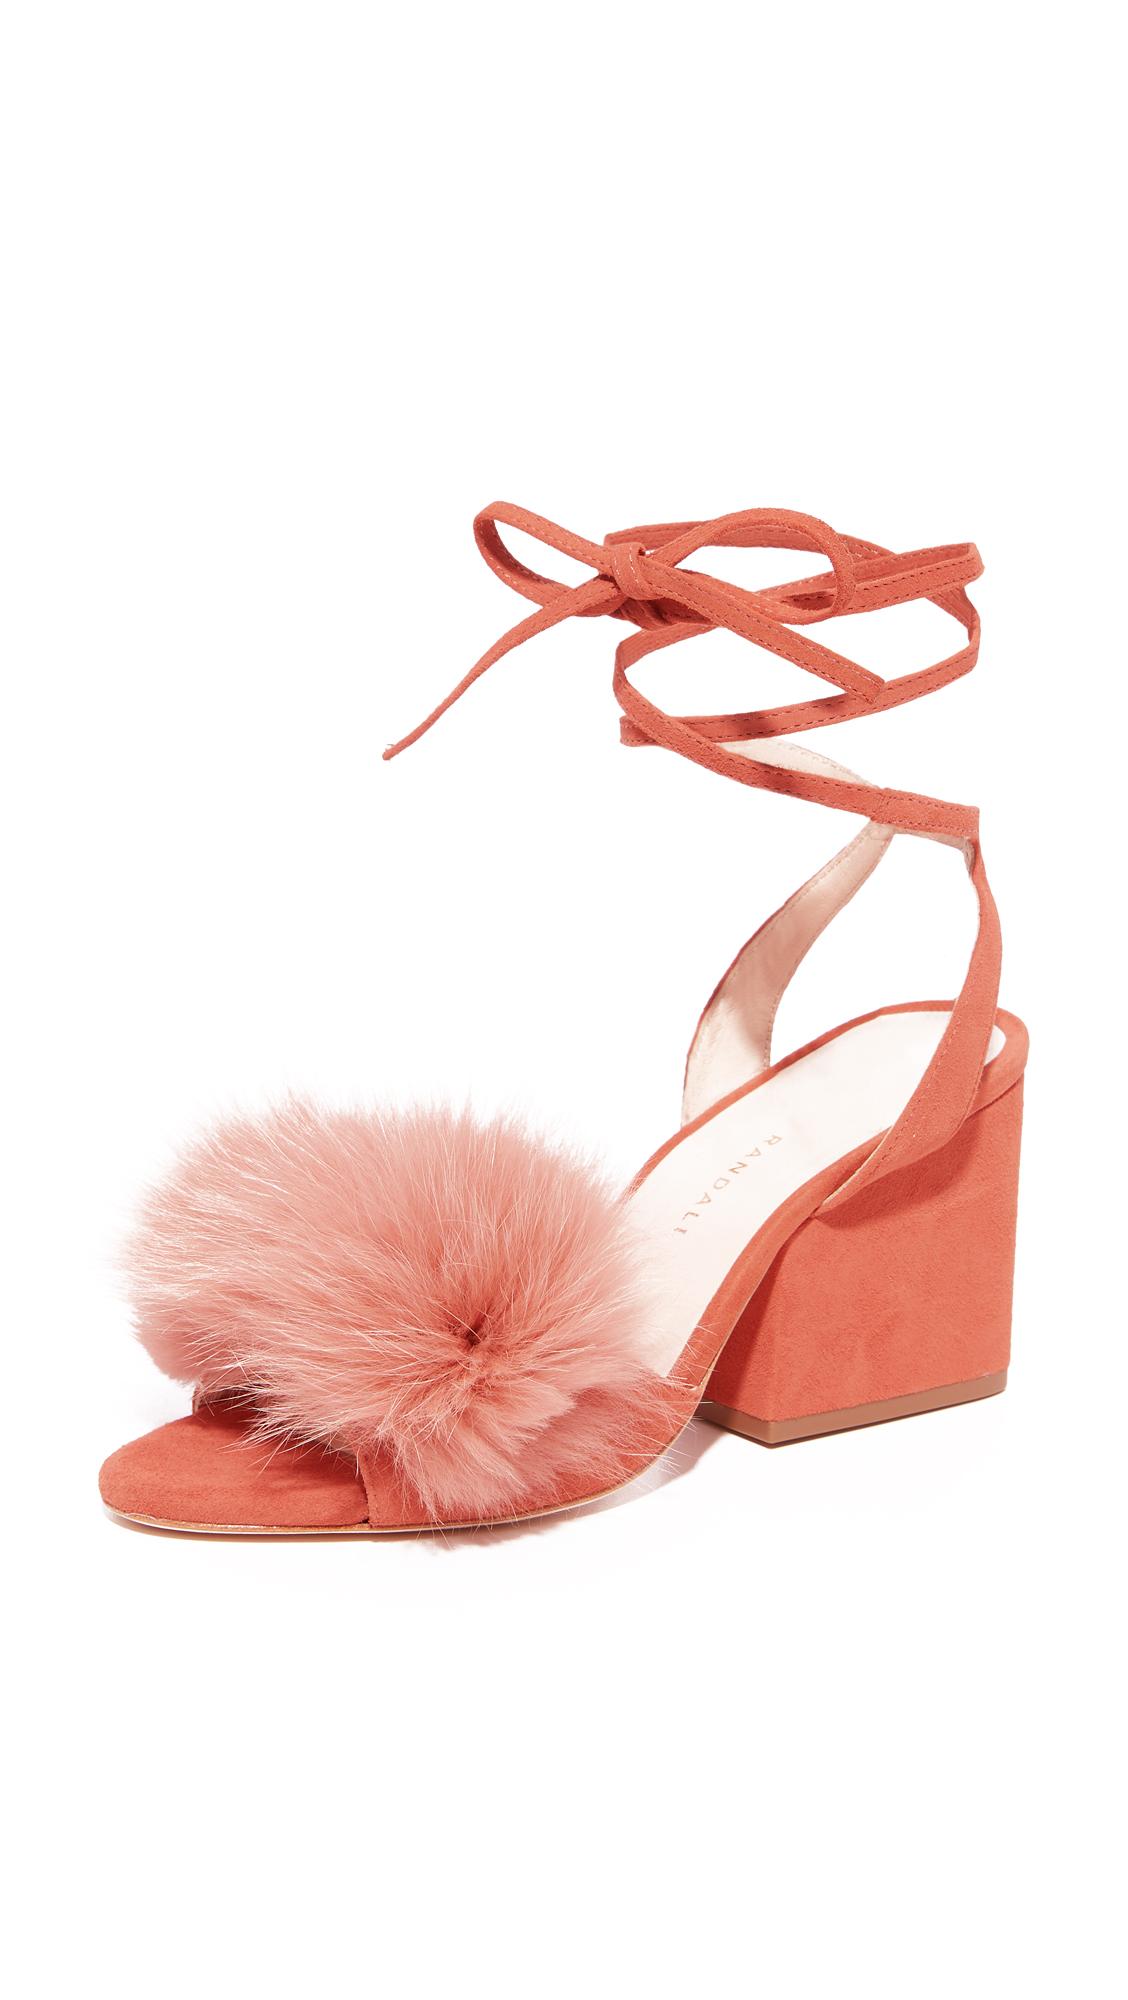 Loeffler Randall Nicky Block Heel Strappy Fur Sandals - Dusty Rose/Dusty Rose